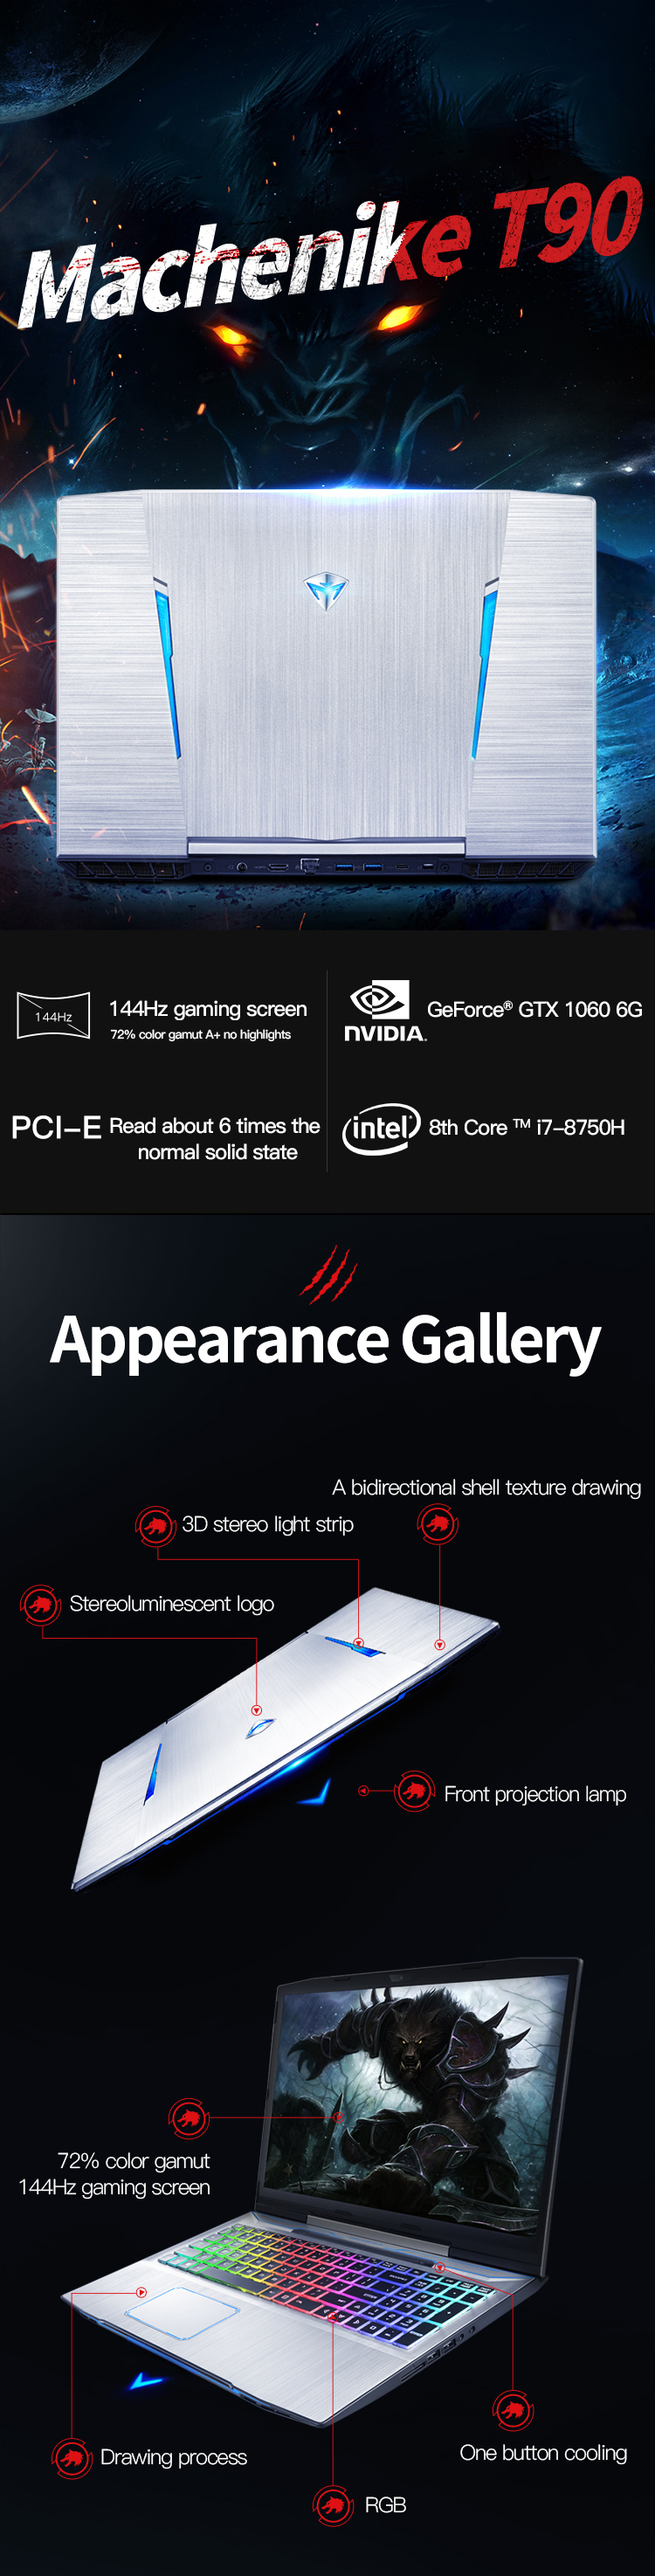 H15272100c3334fac967c117e15cedbd6e Machenike T90-T6C Gaming Laptop (Intel Core i7-8750H+GTX 1060 6G/8GB RAM/256G SSD/15.6'' 144Hz72%NTSC) Machenike-brande notebook